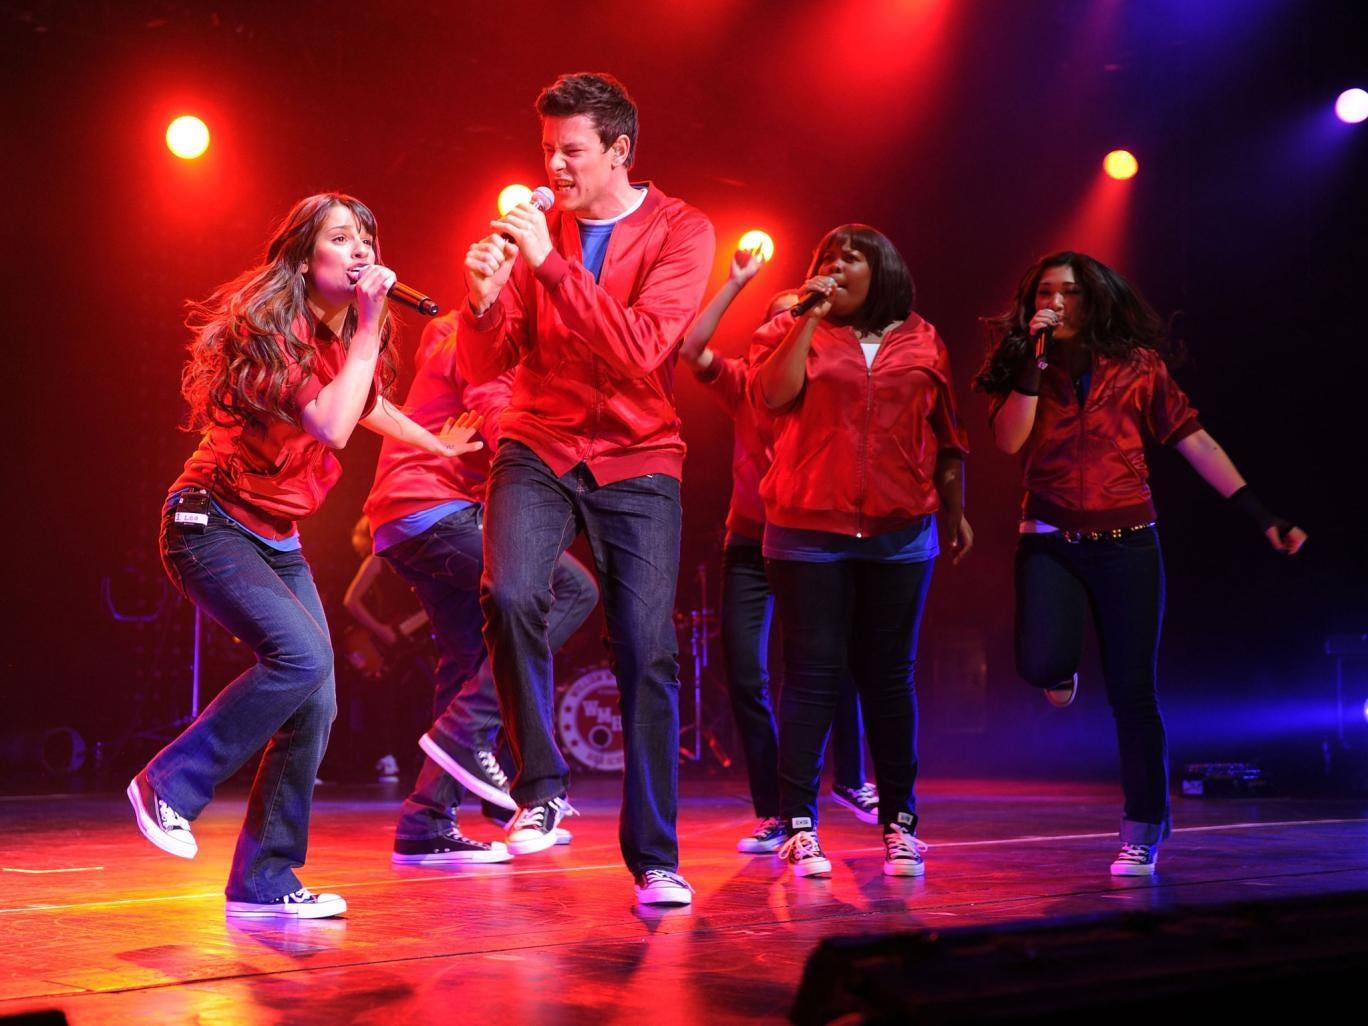 Lea Michele, Cory Monteith, Amber Riley and Jenna Ushkowitz perform at Radio City Music Hall, NY in 2010